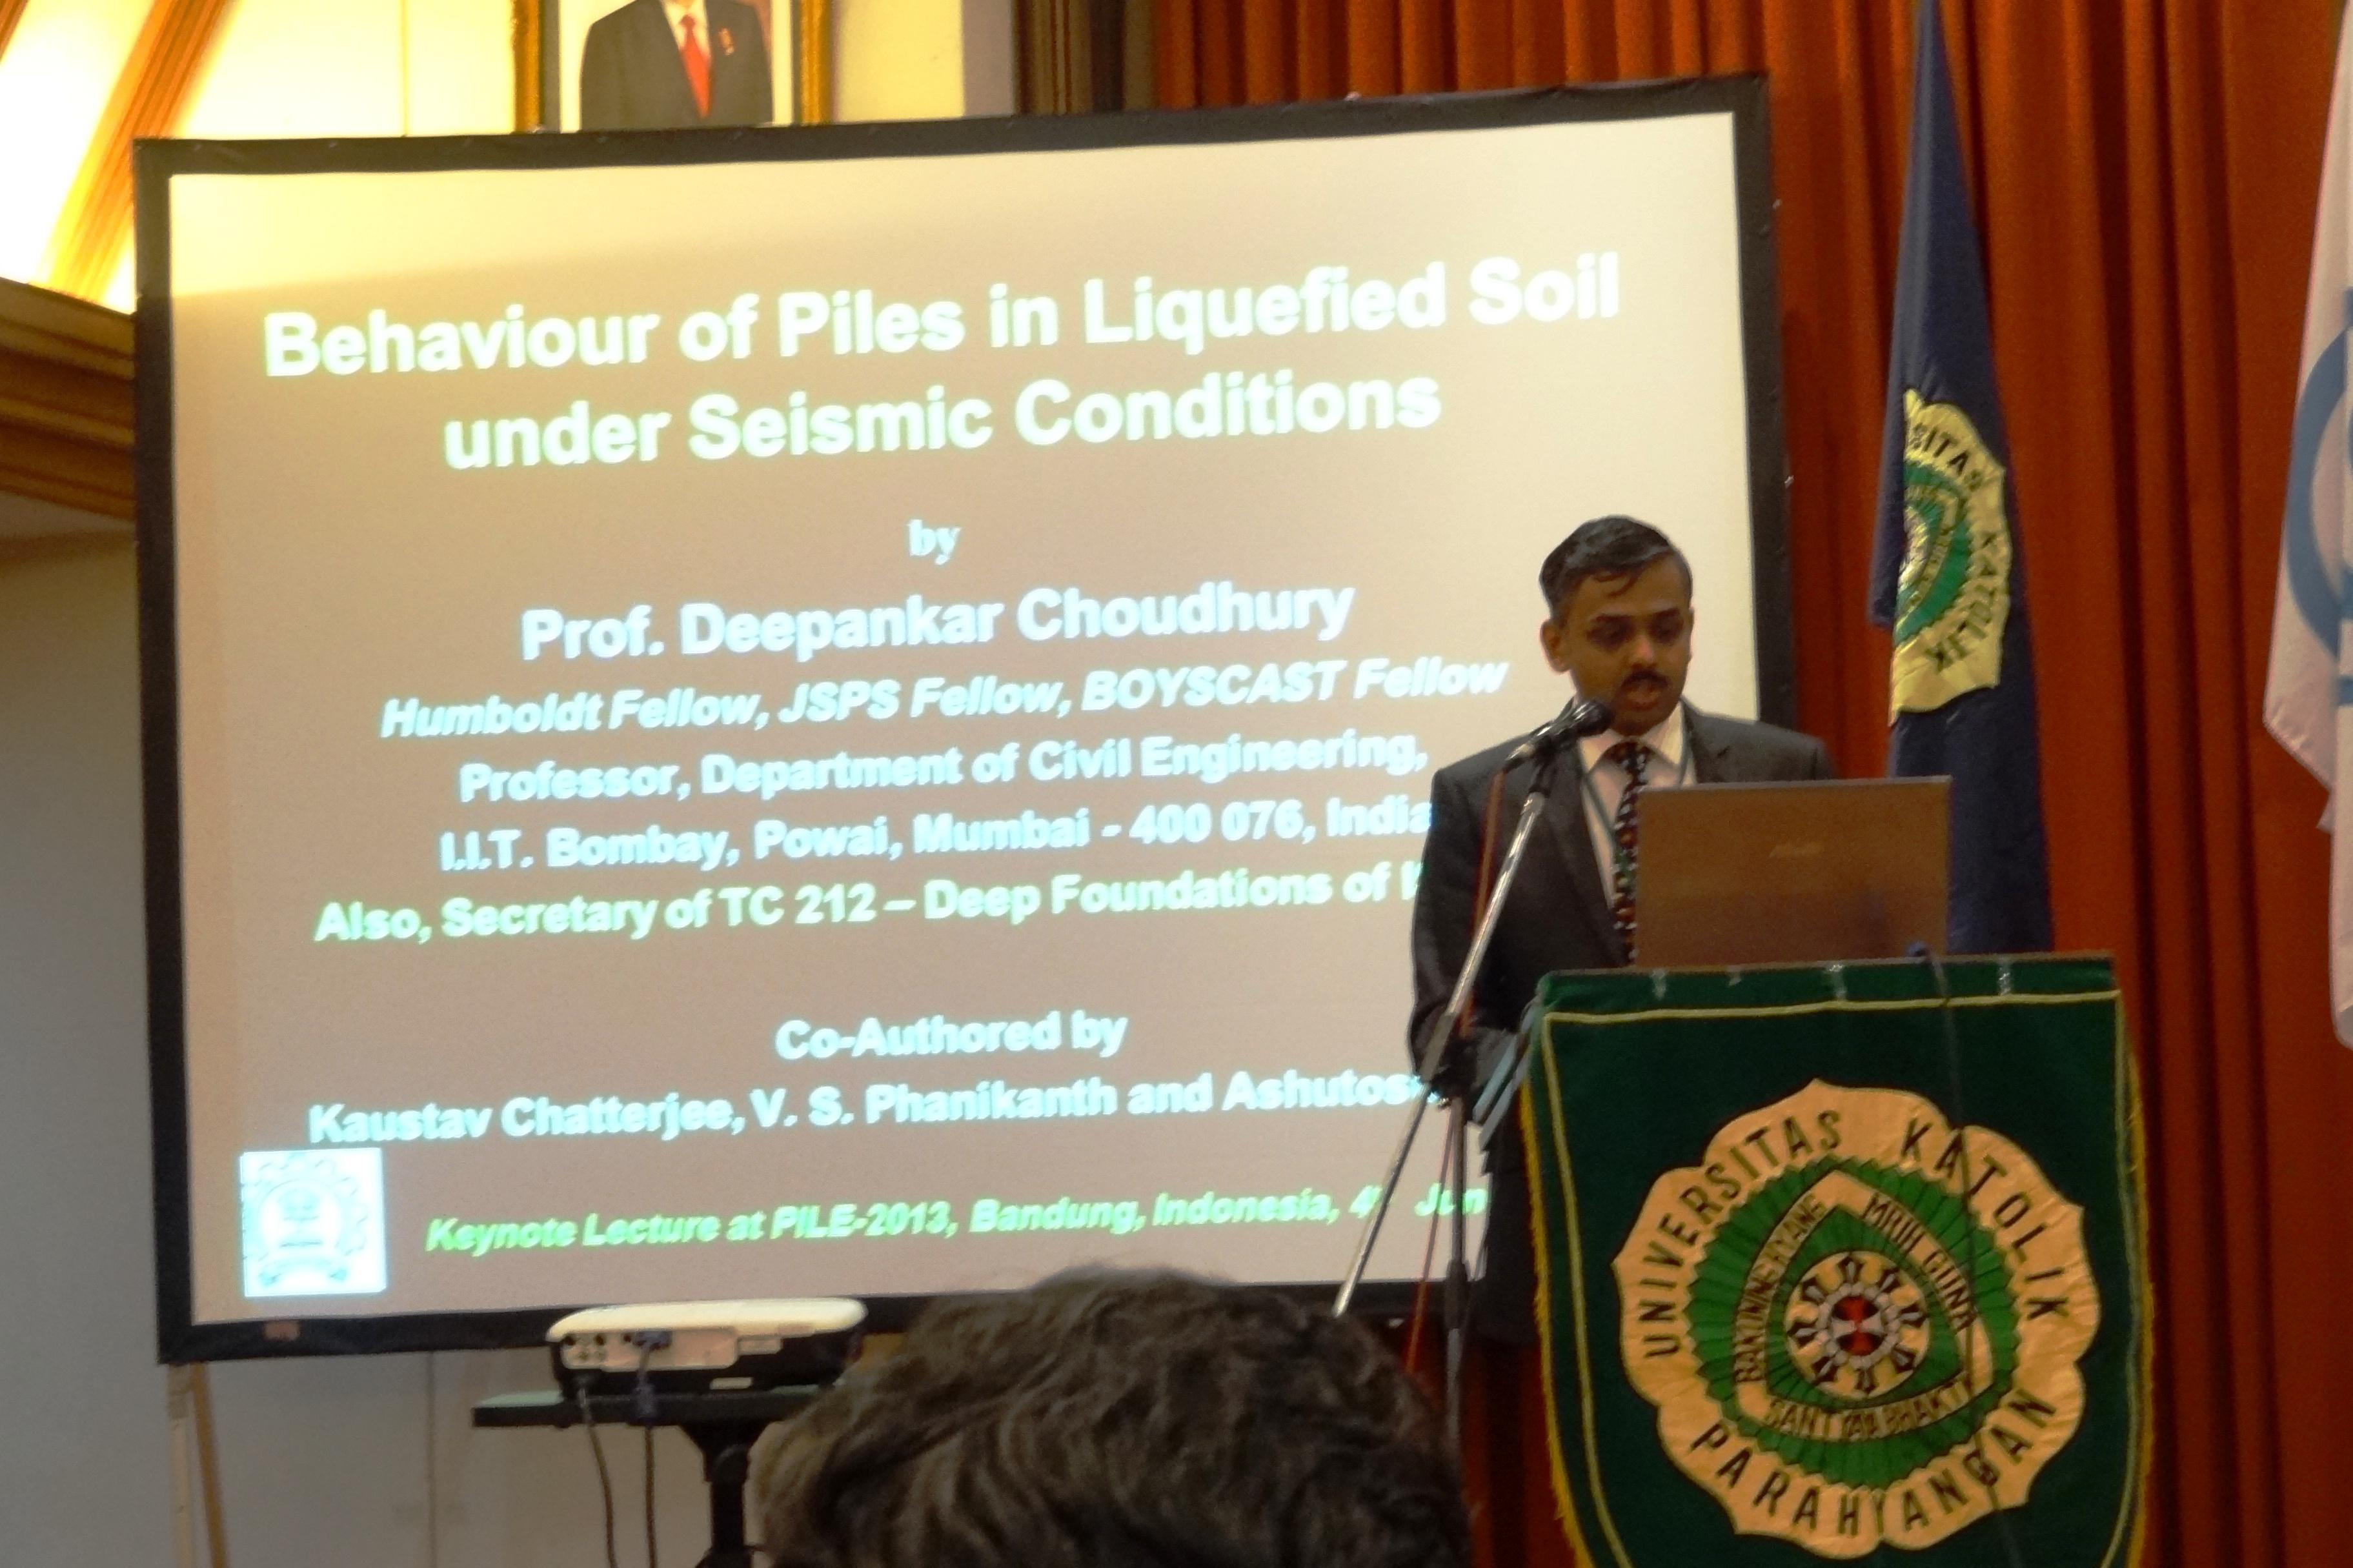 Vr siddhartha engineering college faculty recruitment presentation